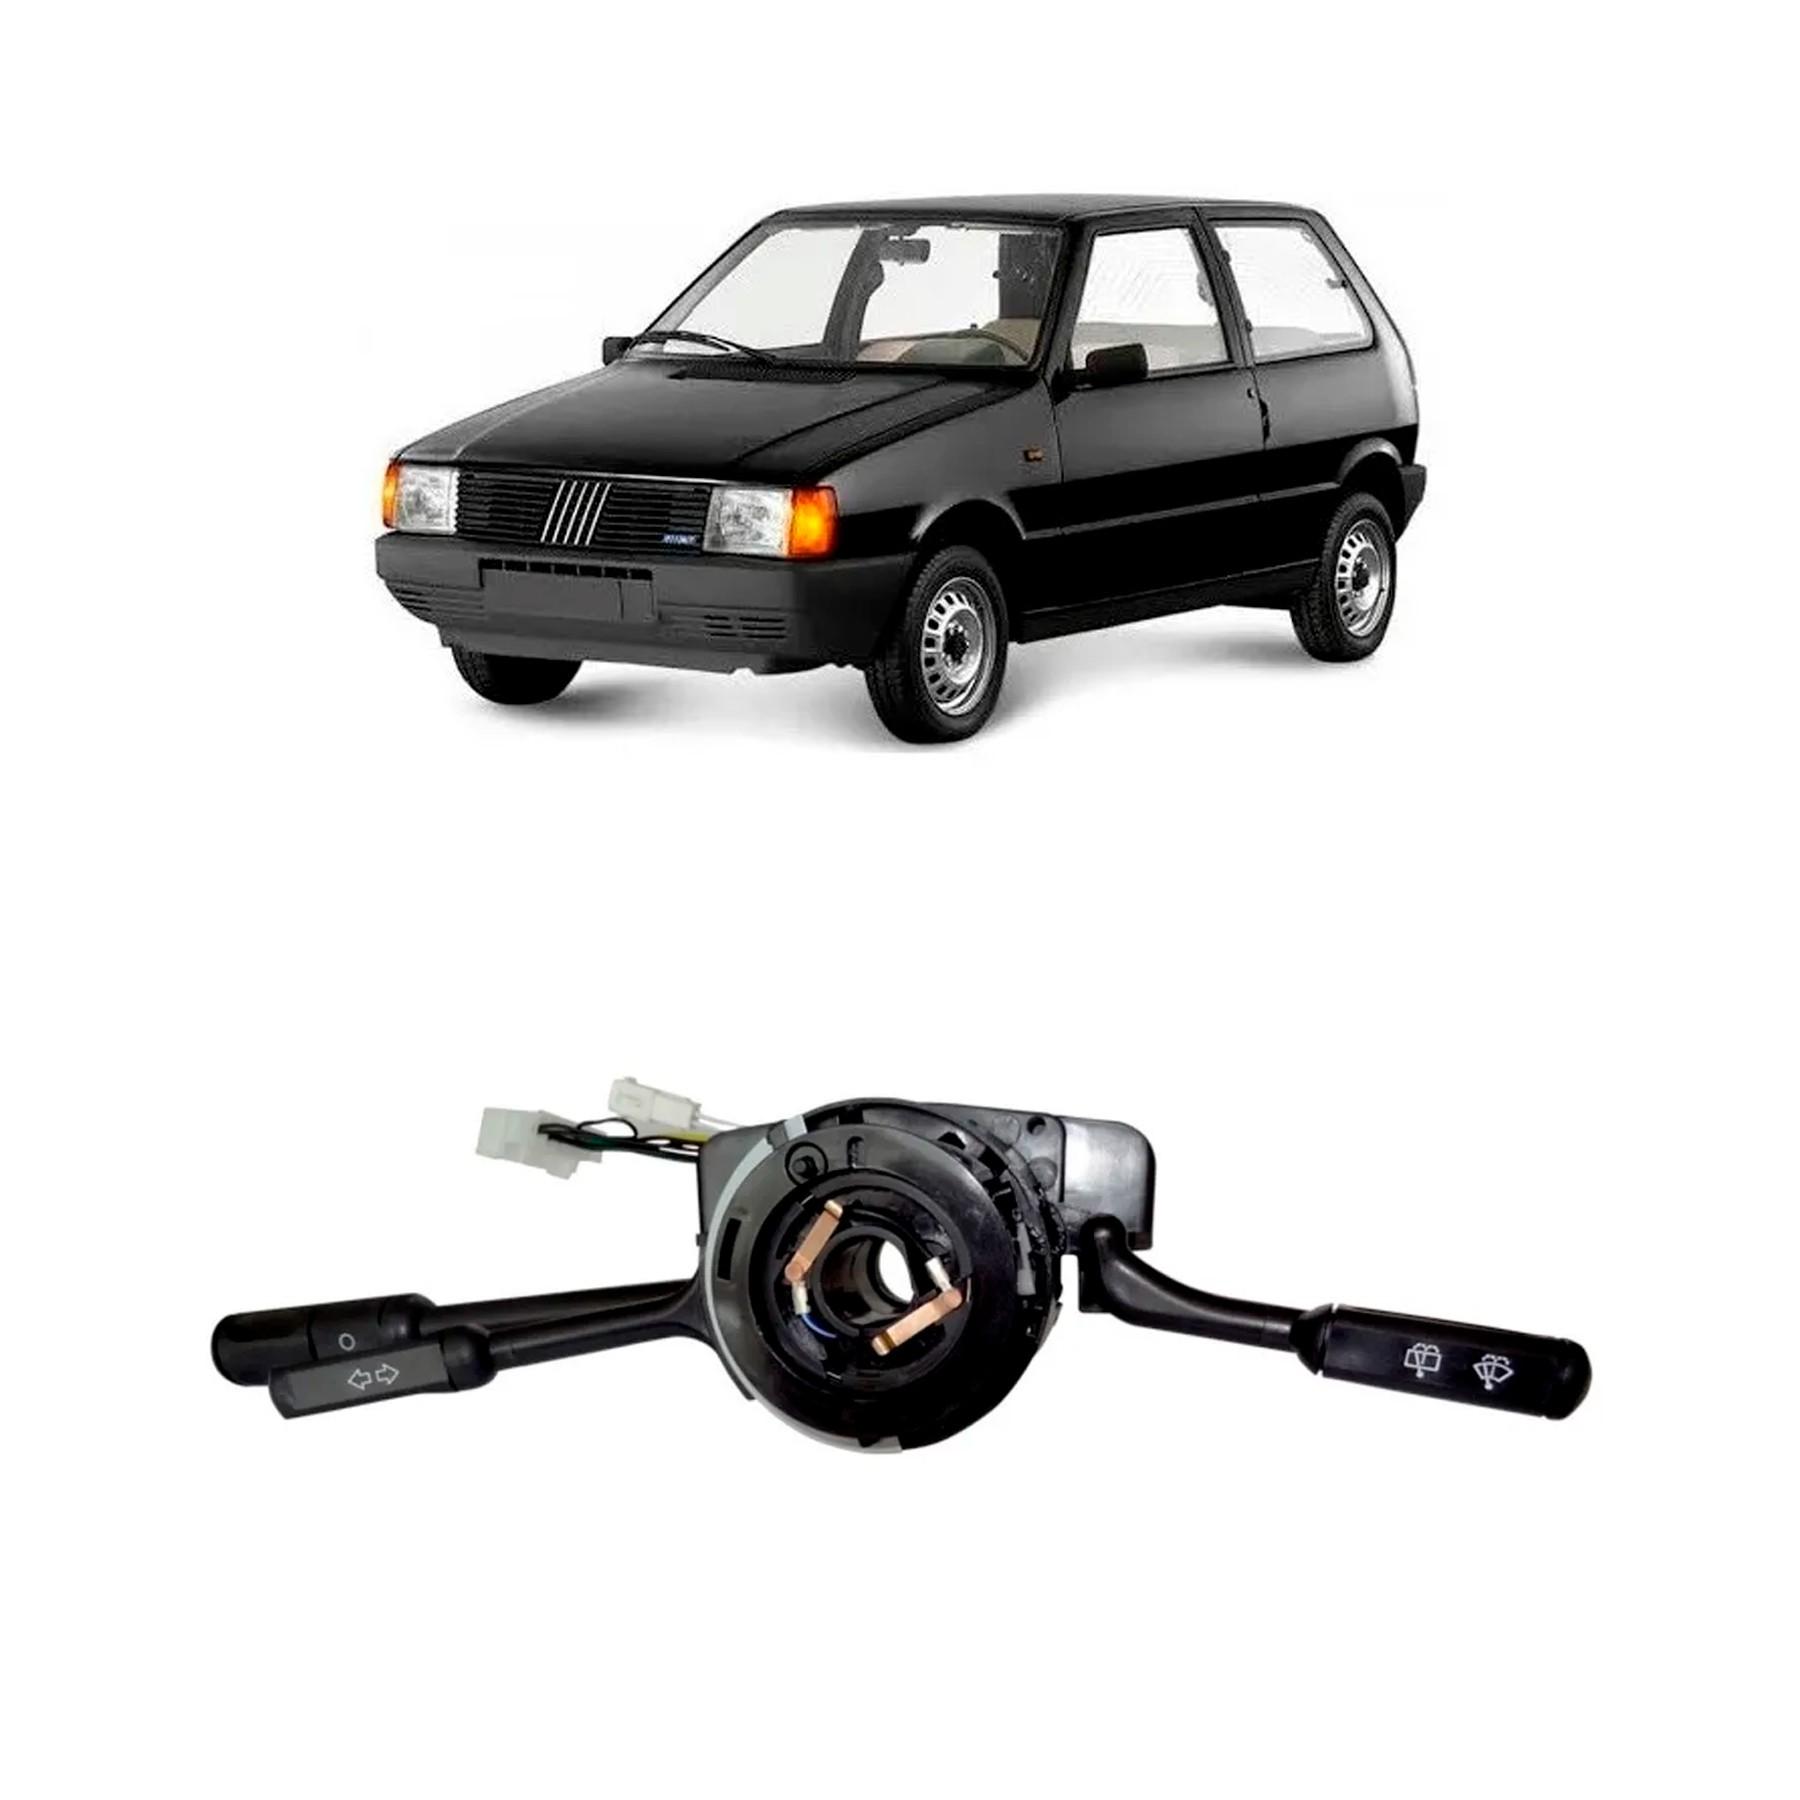 Chave Seta uno/elba 1993 a 2001 com limpador Dianteira e Traseira